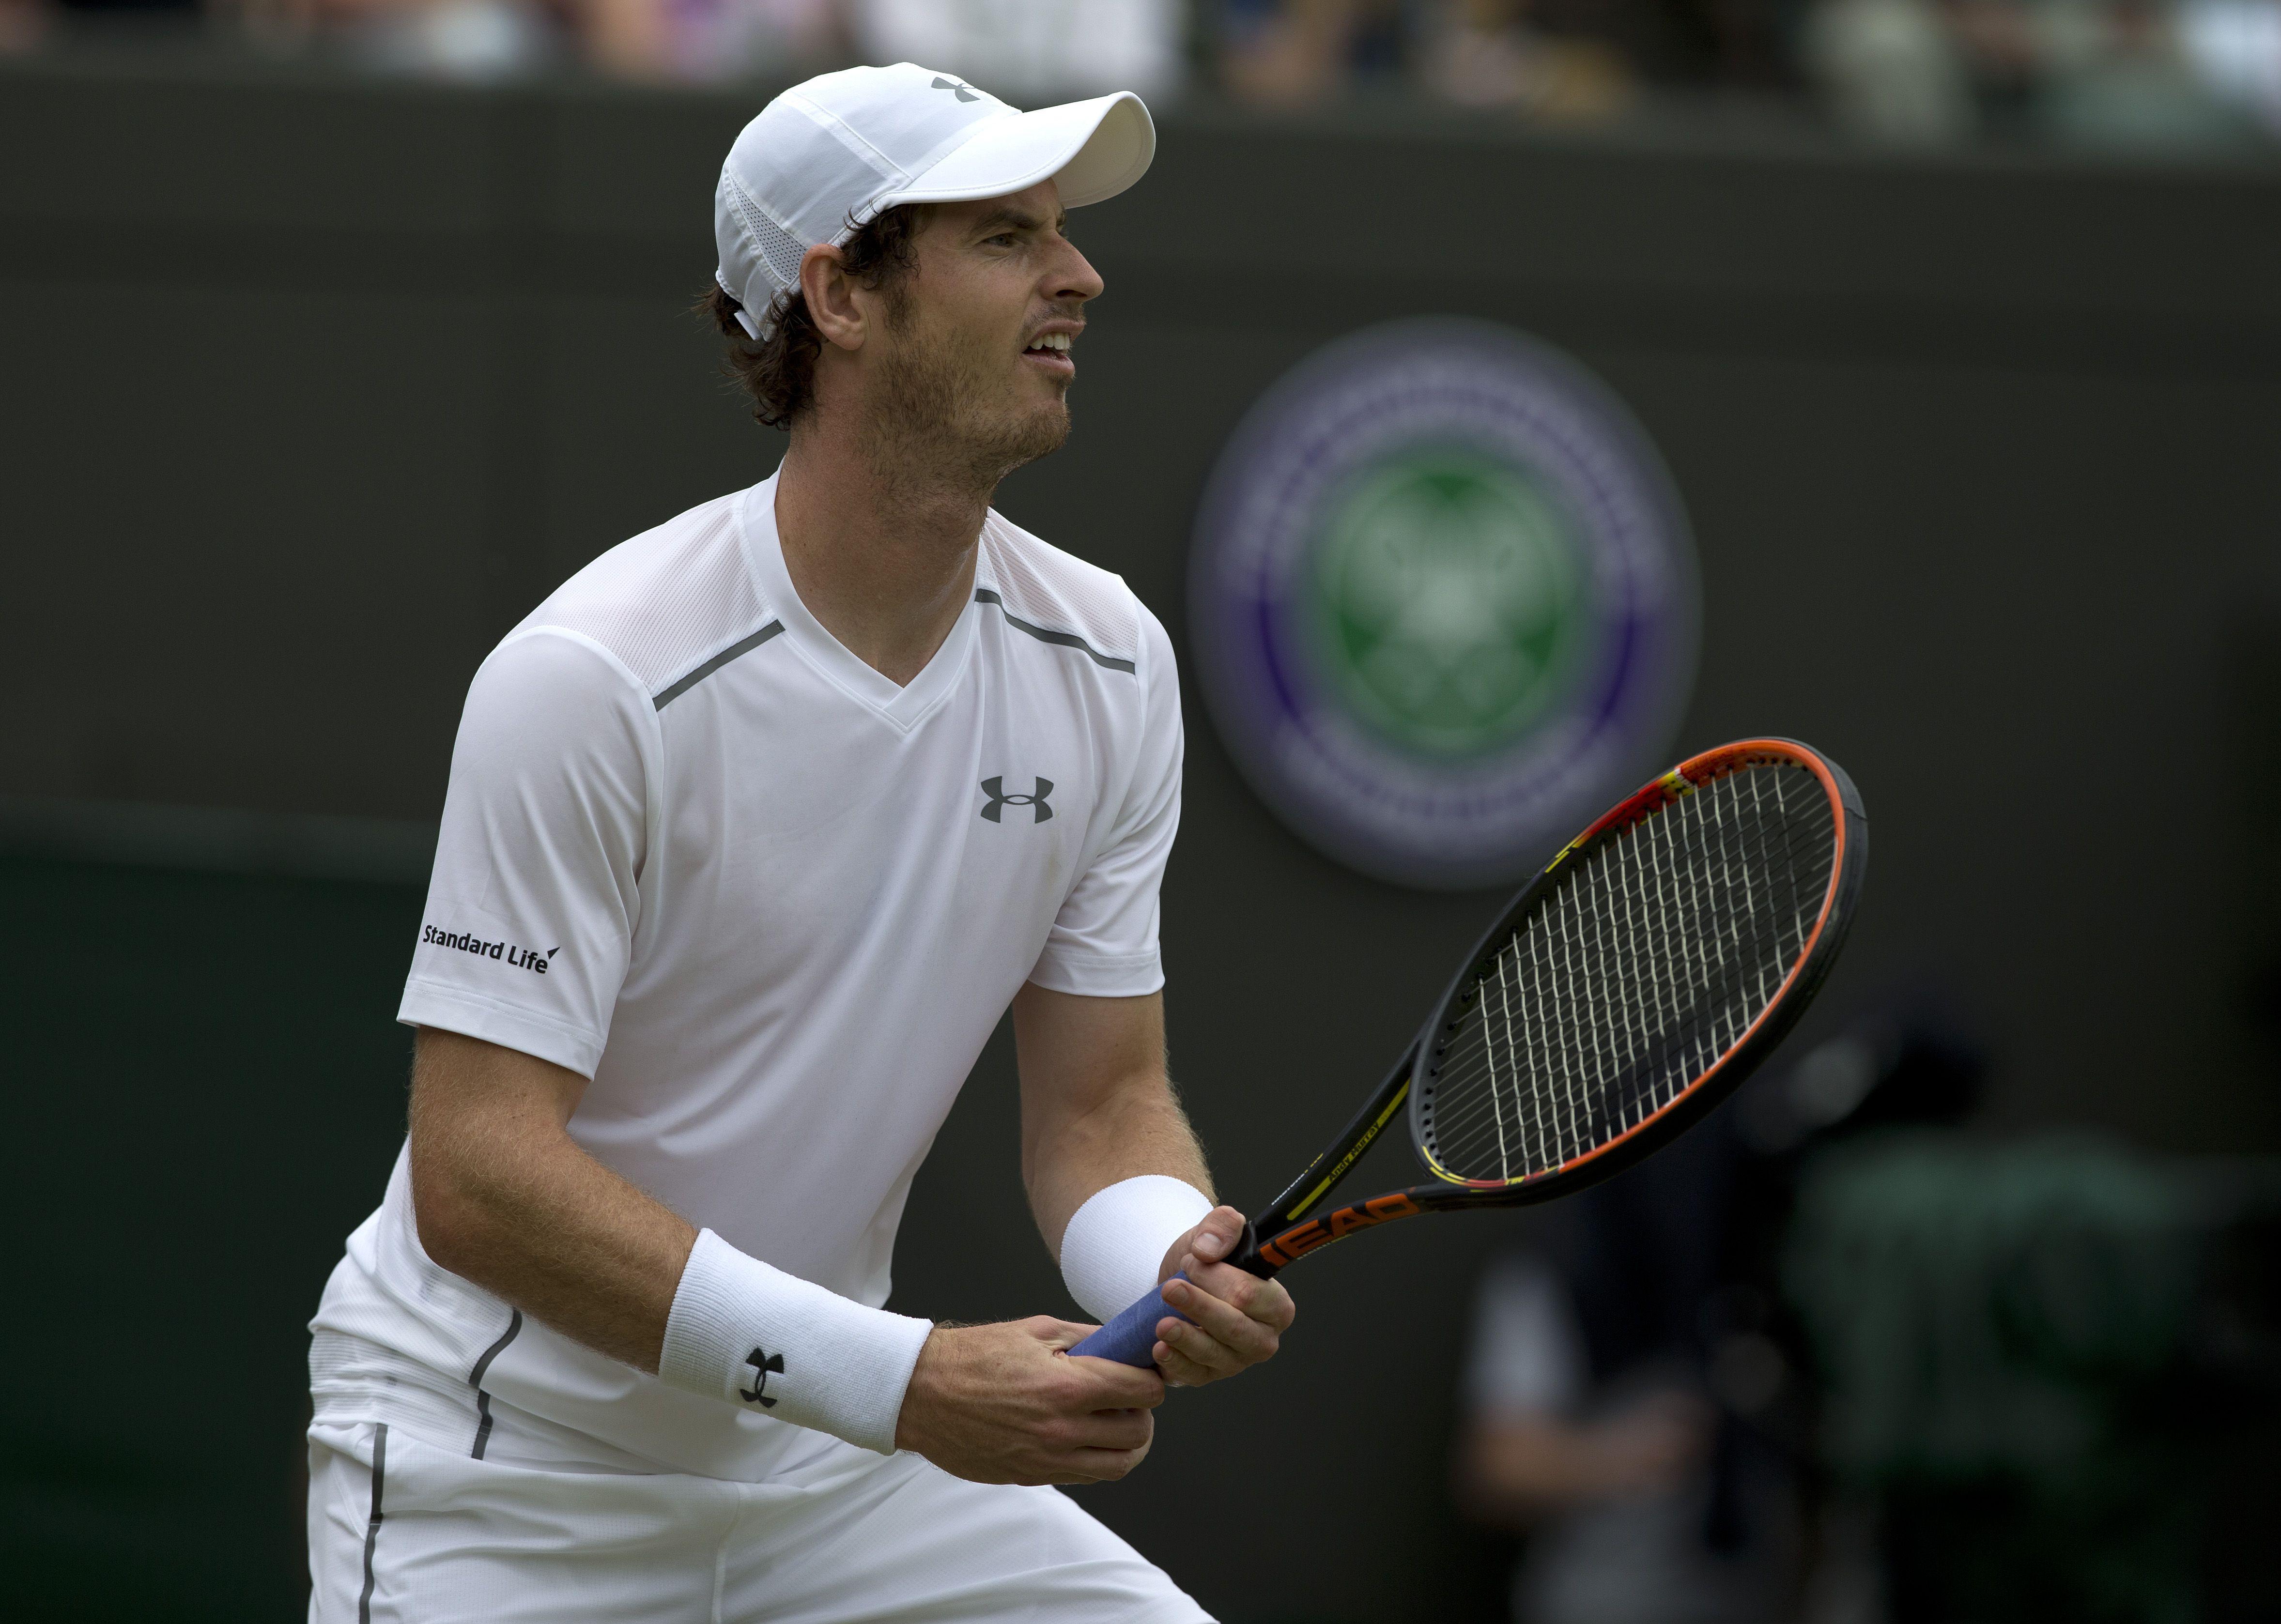 Pin On Wimbledon 2015